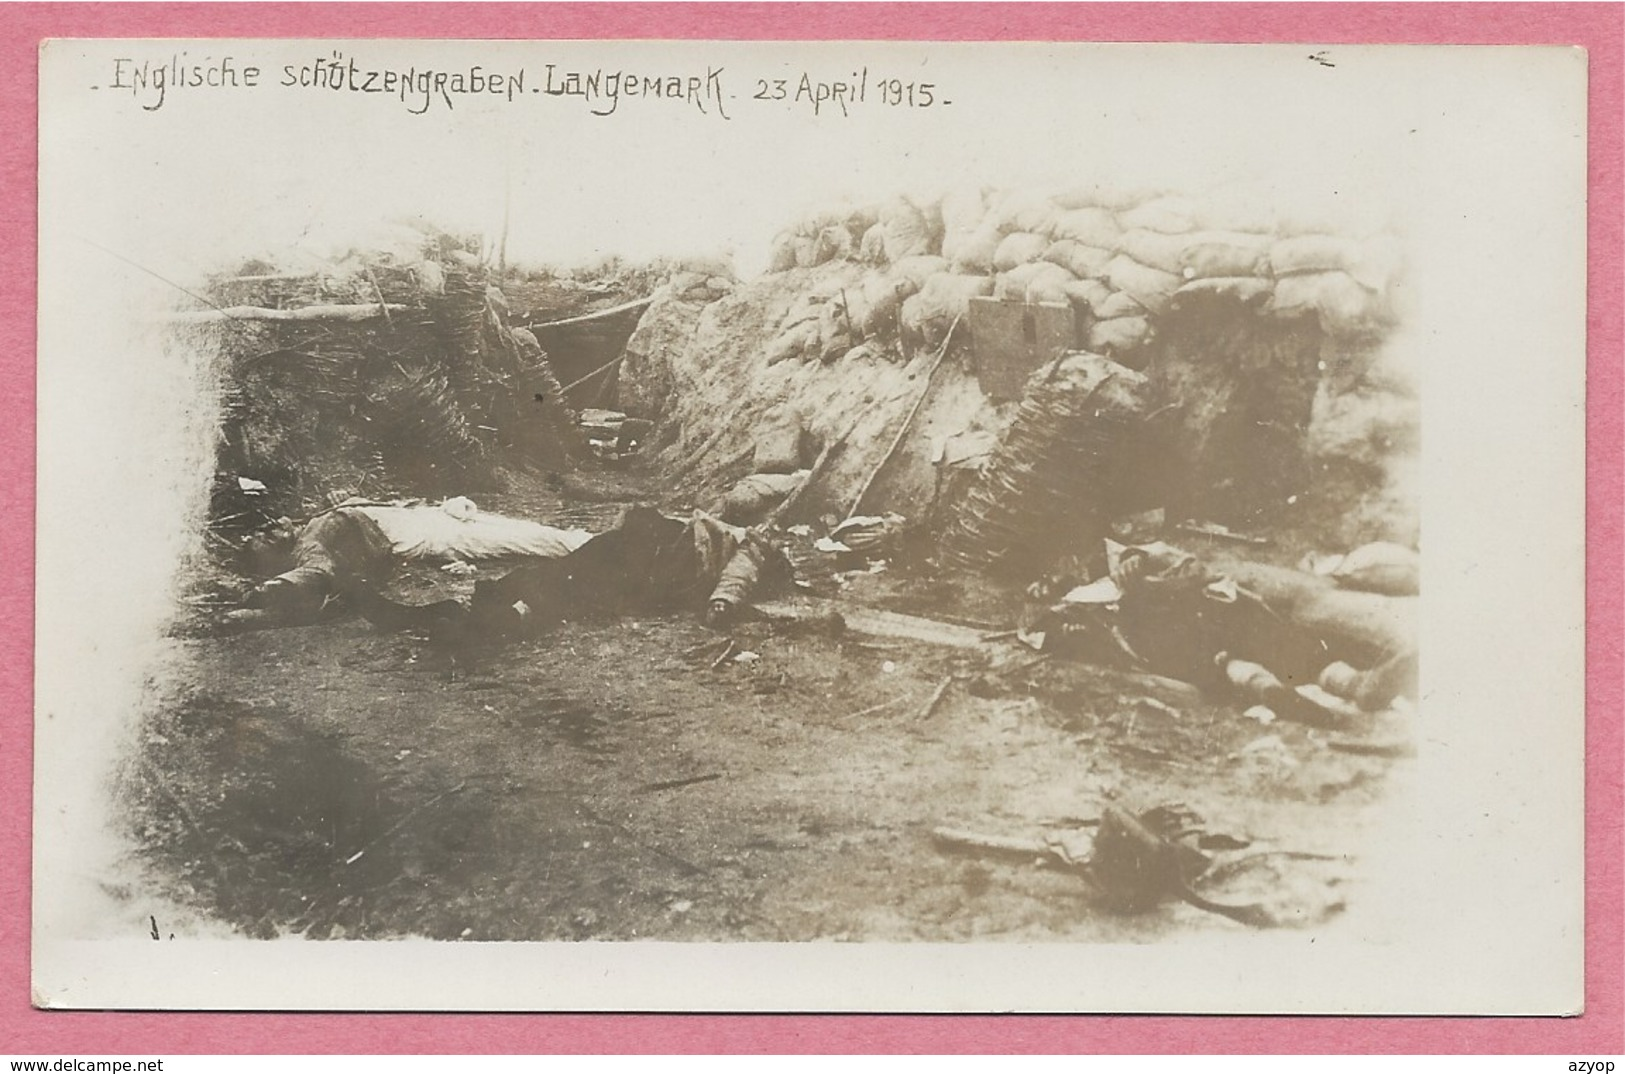 West-Vlaanderen - Flandre Occidentale - Carte Photo - Foto - LANGEMARK - Schützengraben - Guerre 14/18 - Carte N° 16 - Langemark-Poelkapelle